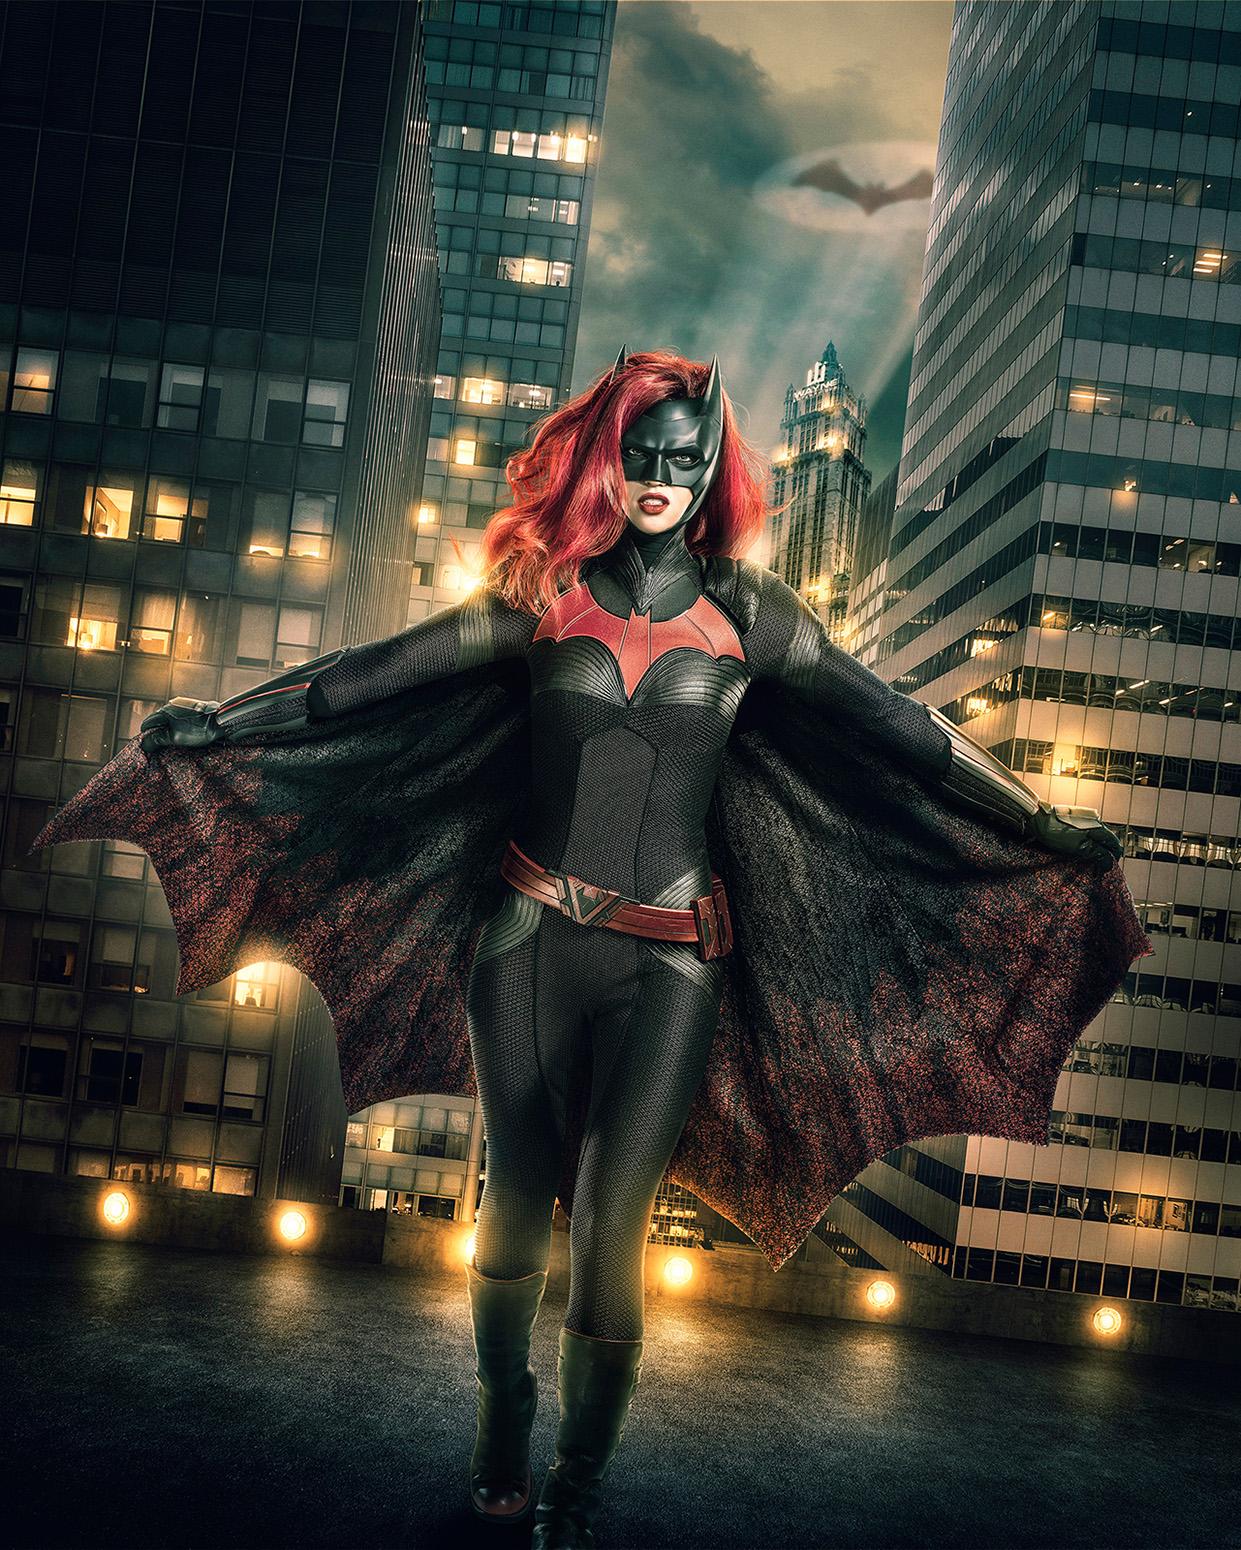 batwoman_1stlook_v5_attachment.jpg